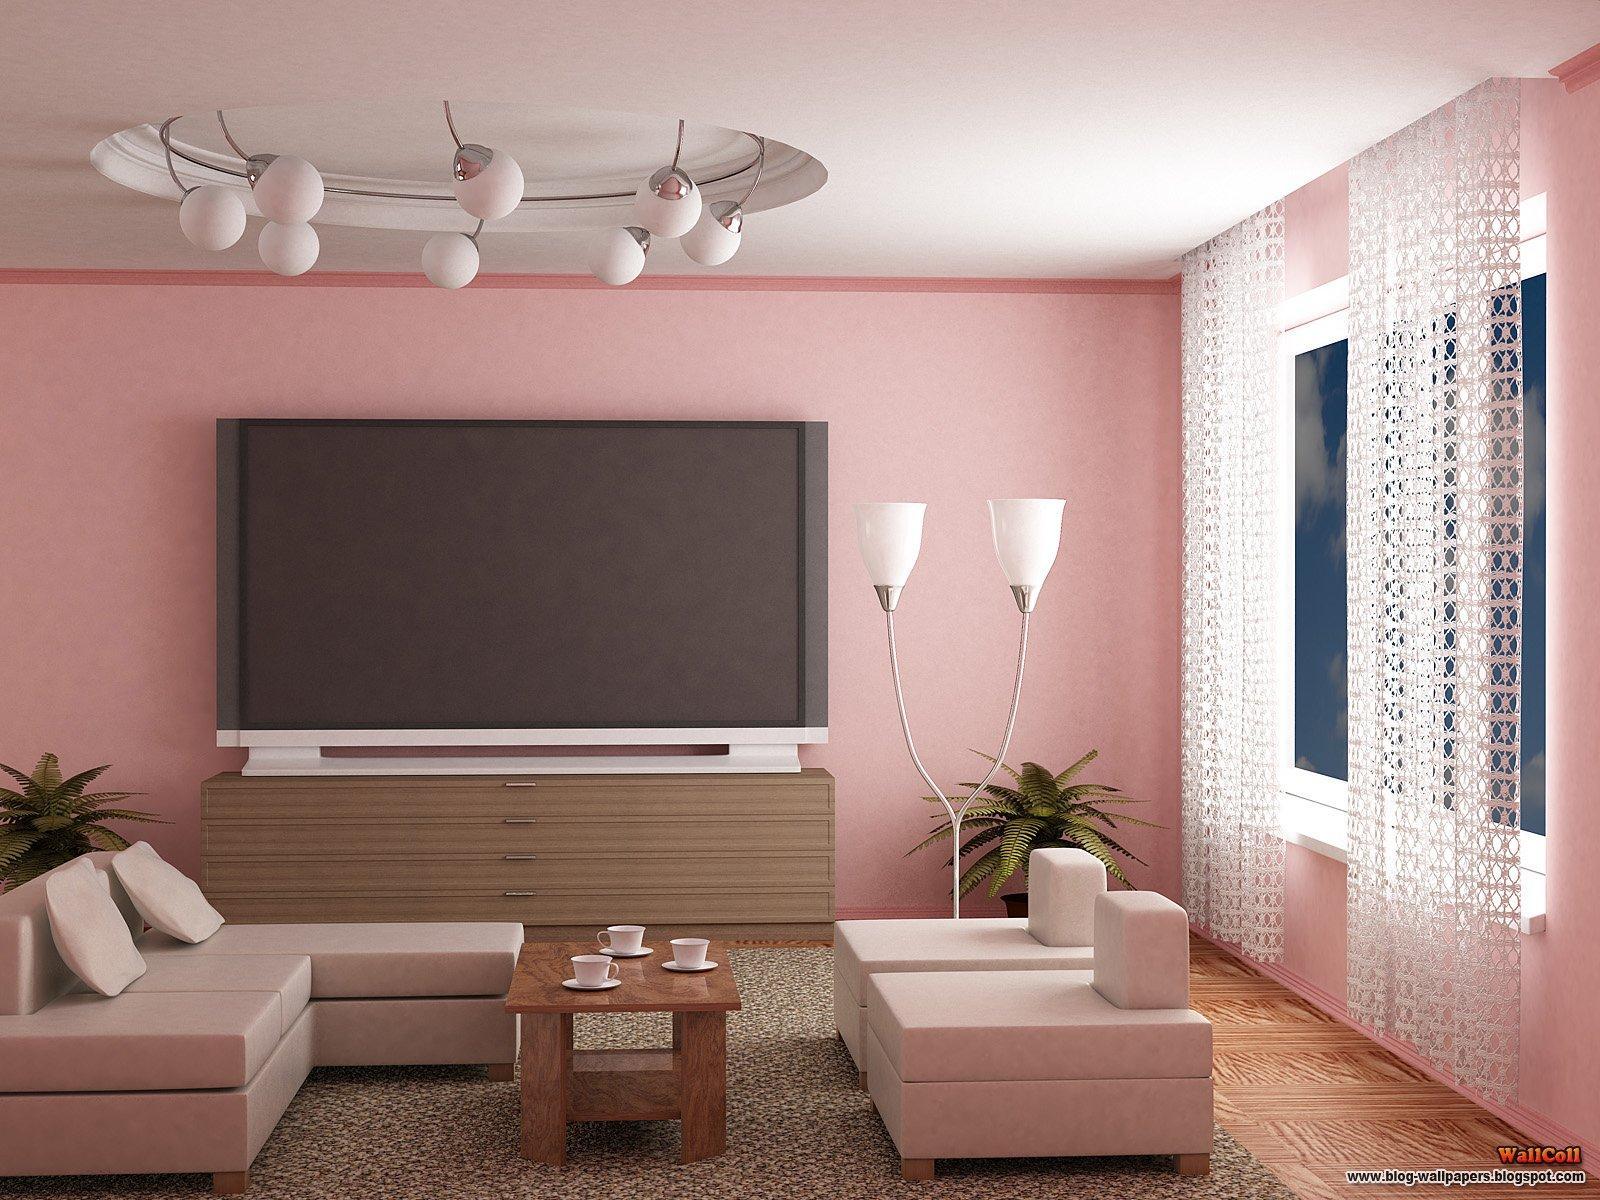 4302009104420 How to decorate home for Raksha Bandhan